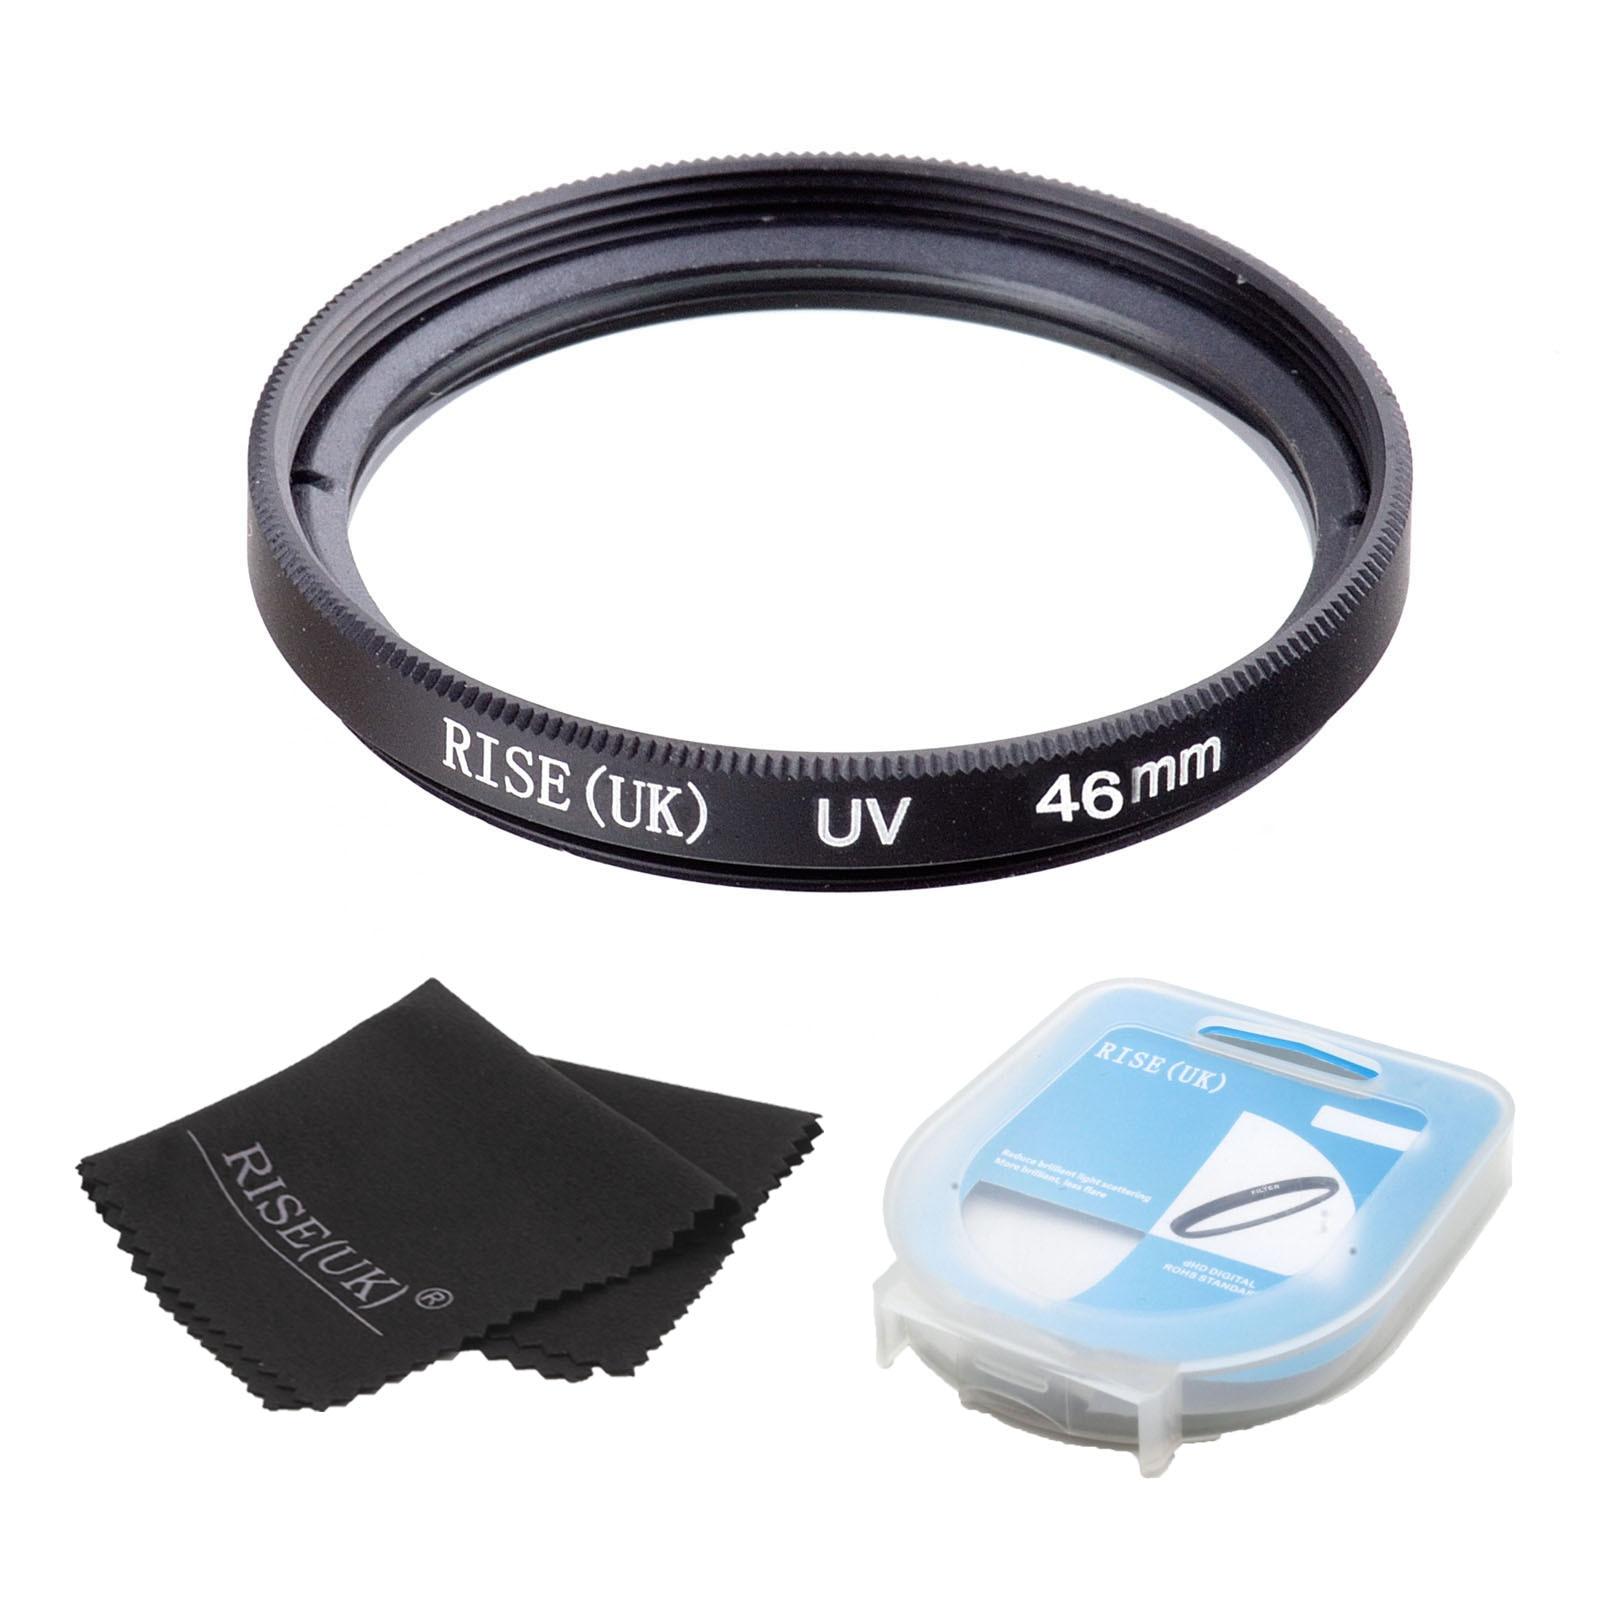 ▽Envío libre 46mm RISE (UK) filtro UV lente 46mm lente para DSLR ...